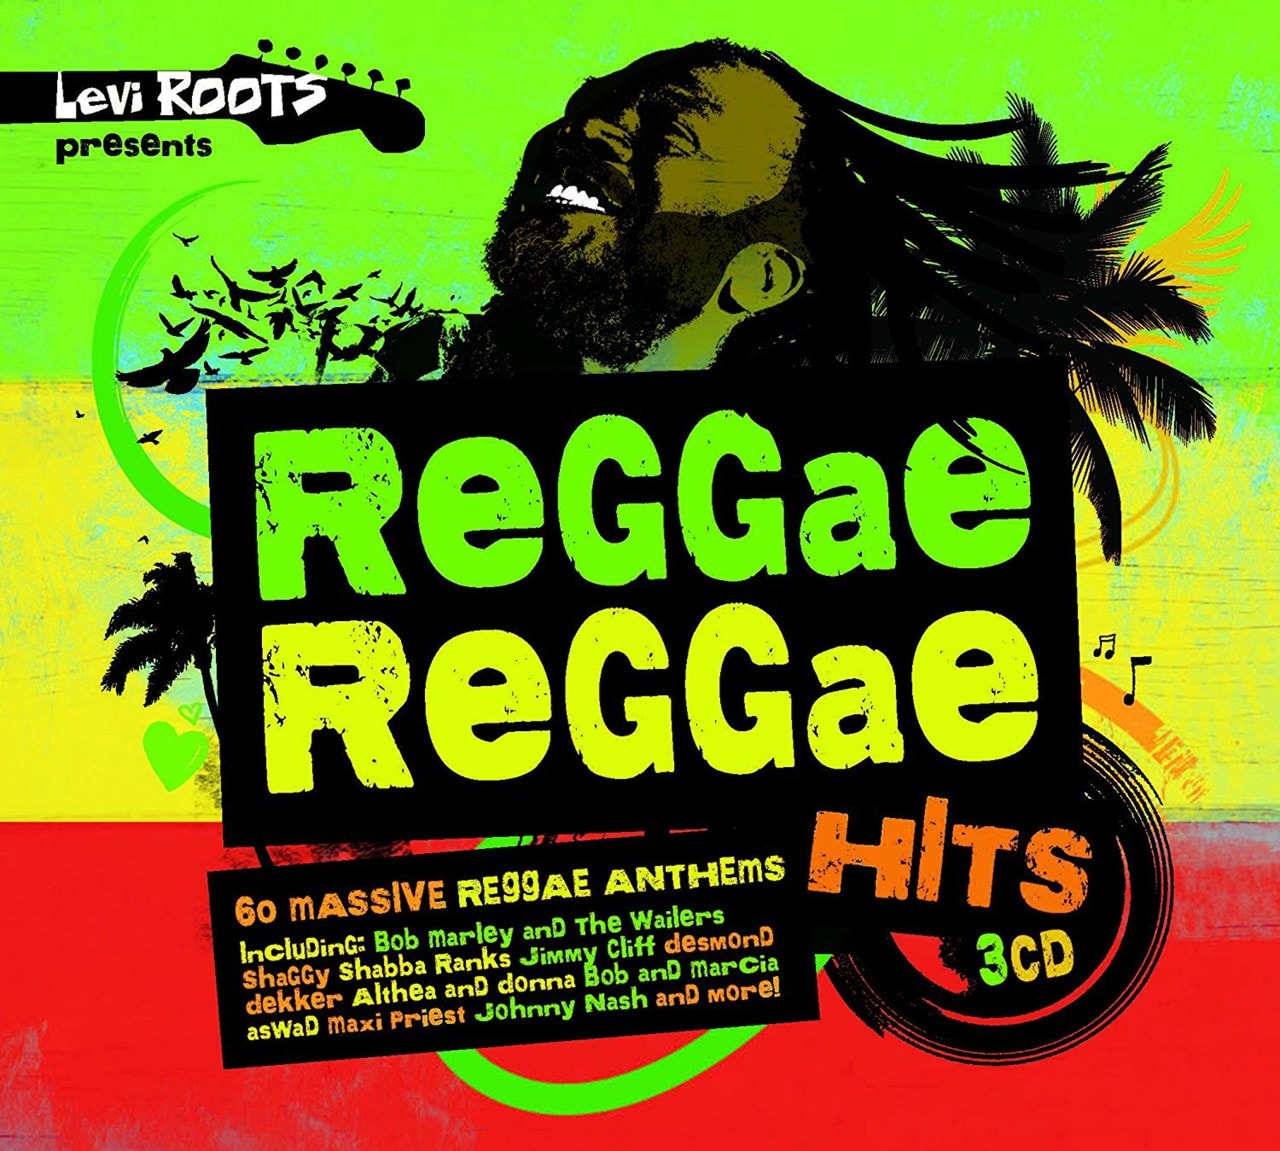 Levi Roots Presents Reggae Reggae Hits - 1